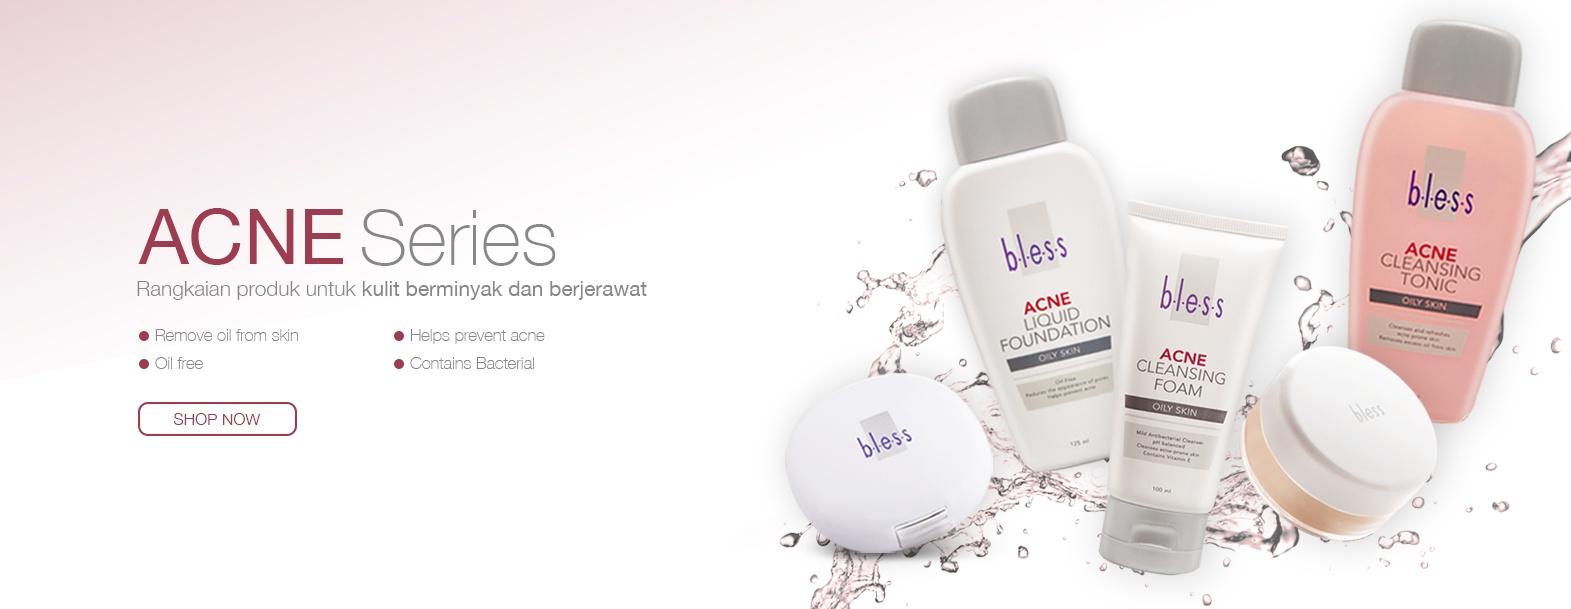 slide-acne-series-05